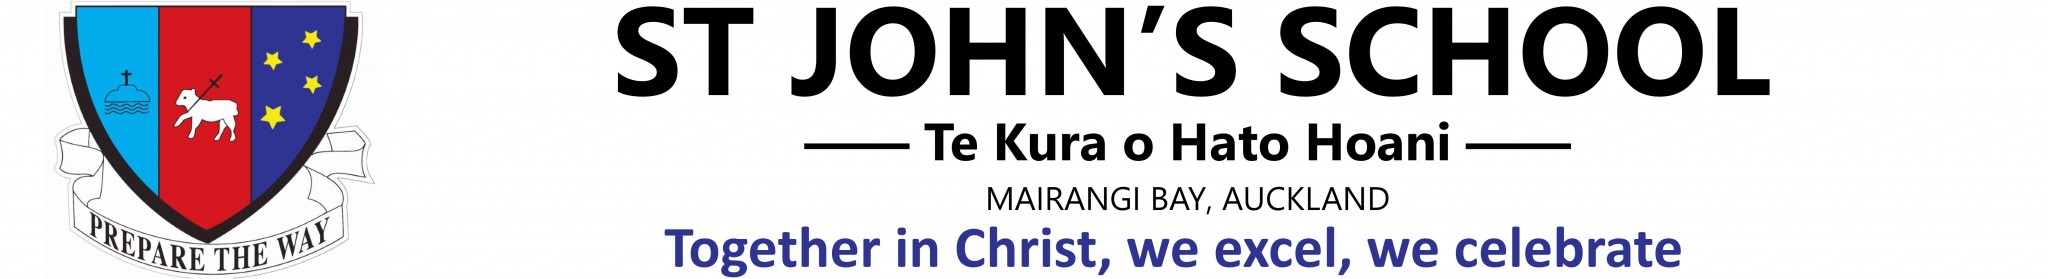 St Johns School Mairangi Bay Logo